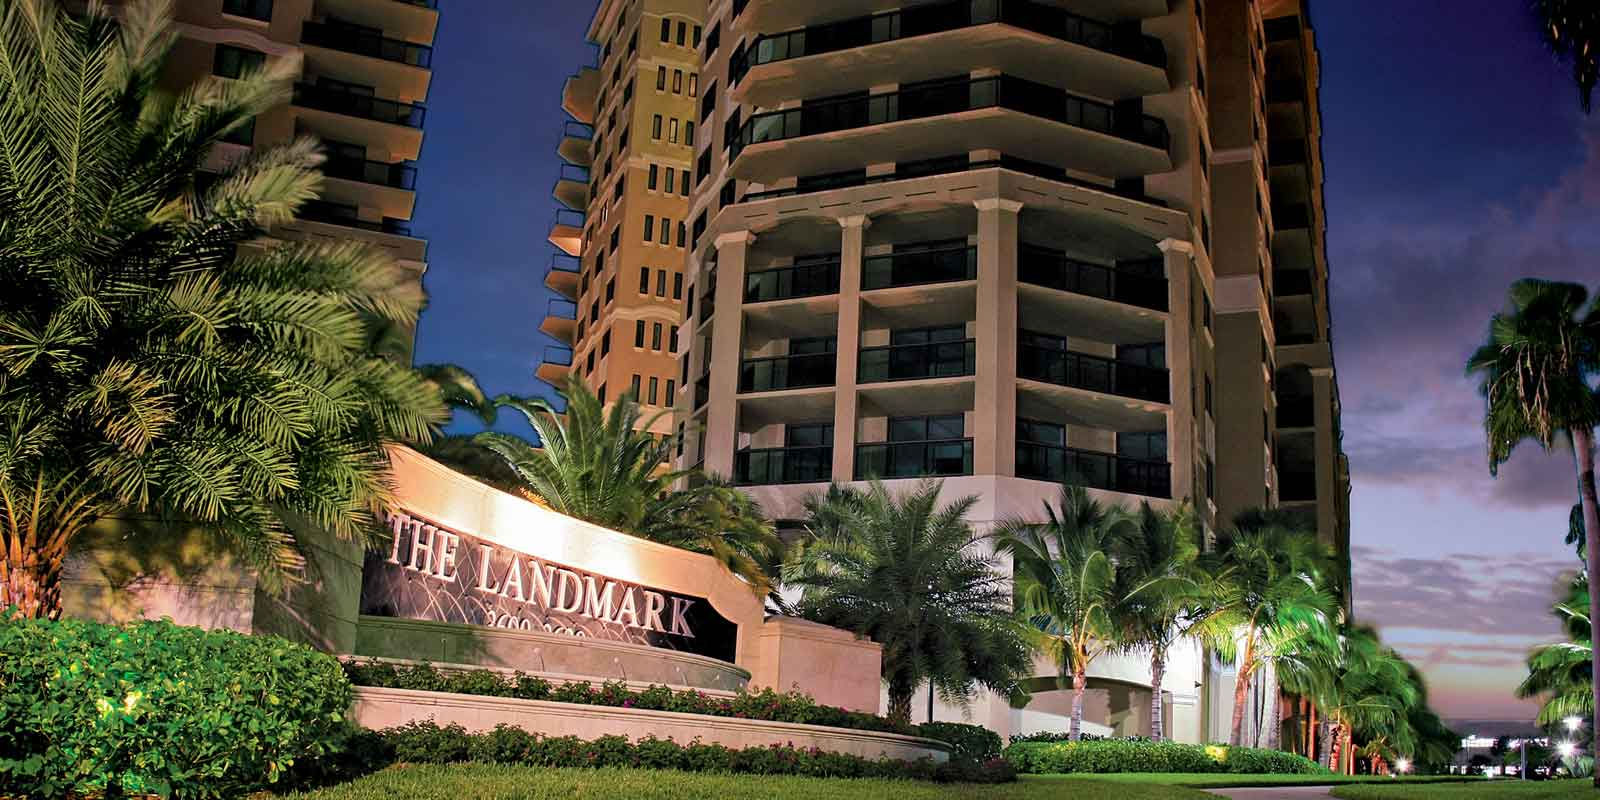 Condominium Marketing Real Estate Strategy Cotton And